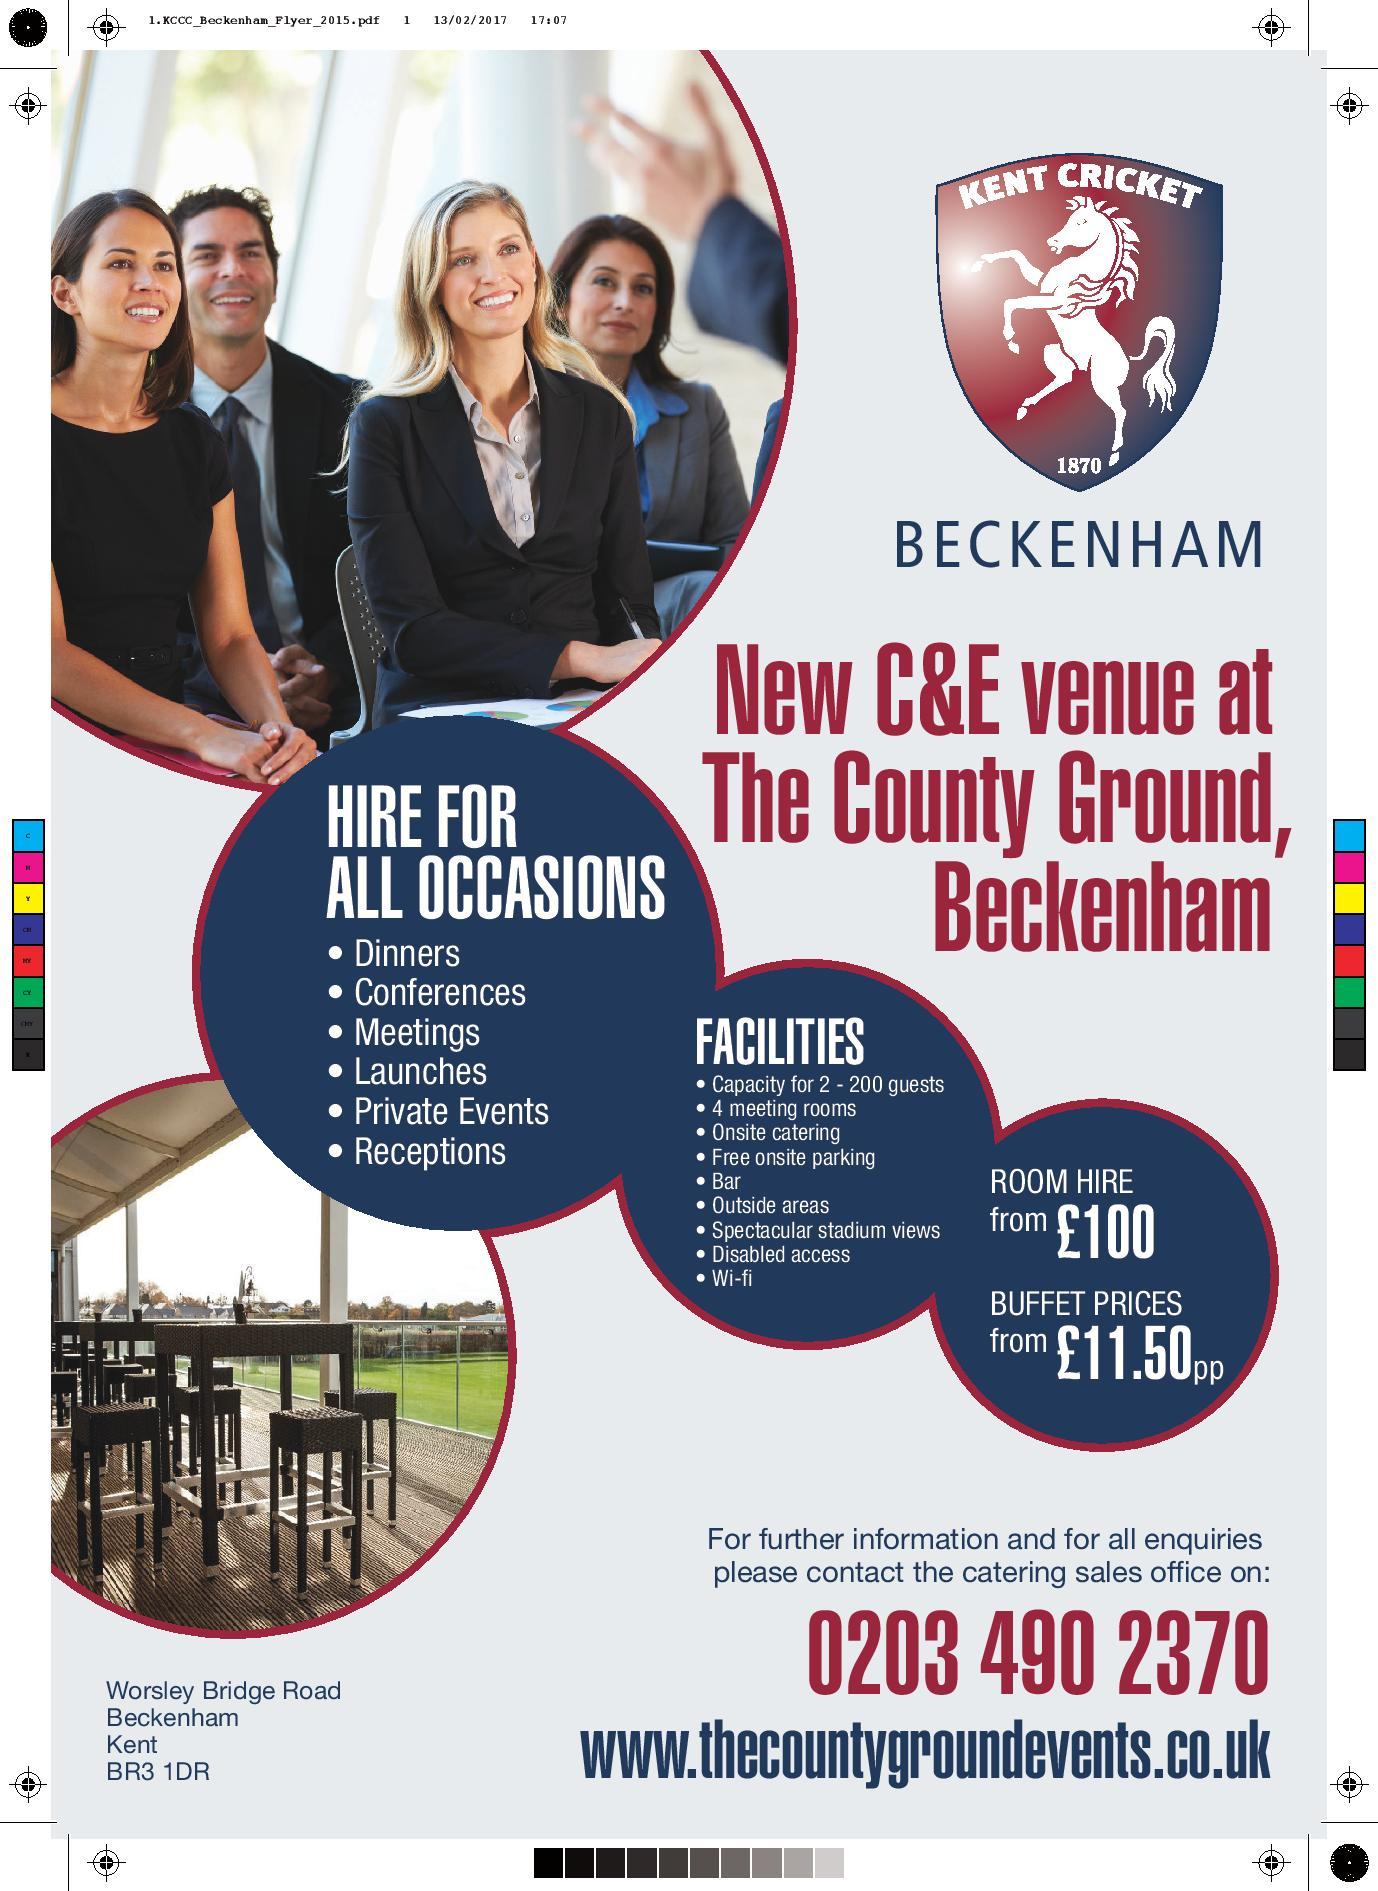 1.KCCC_Beckenham_Flyer_2015-page-001.jpg